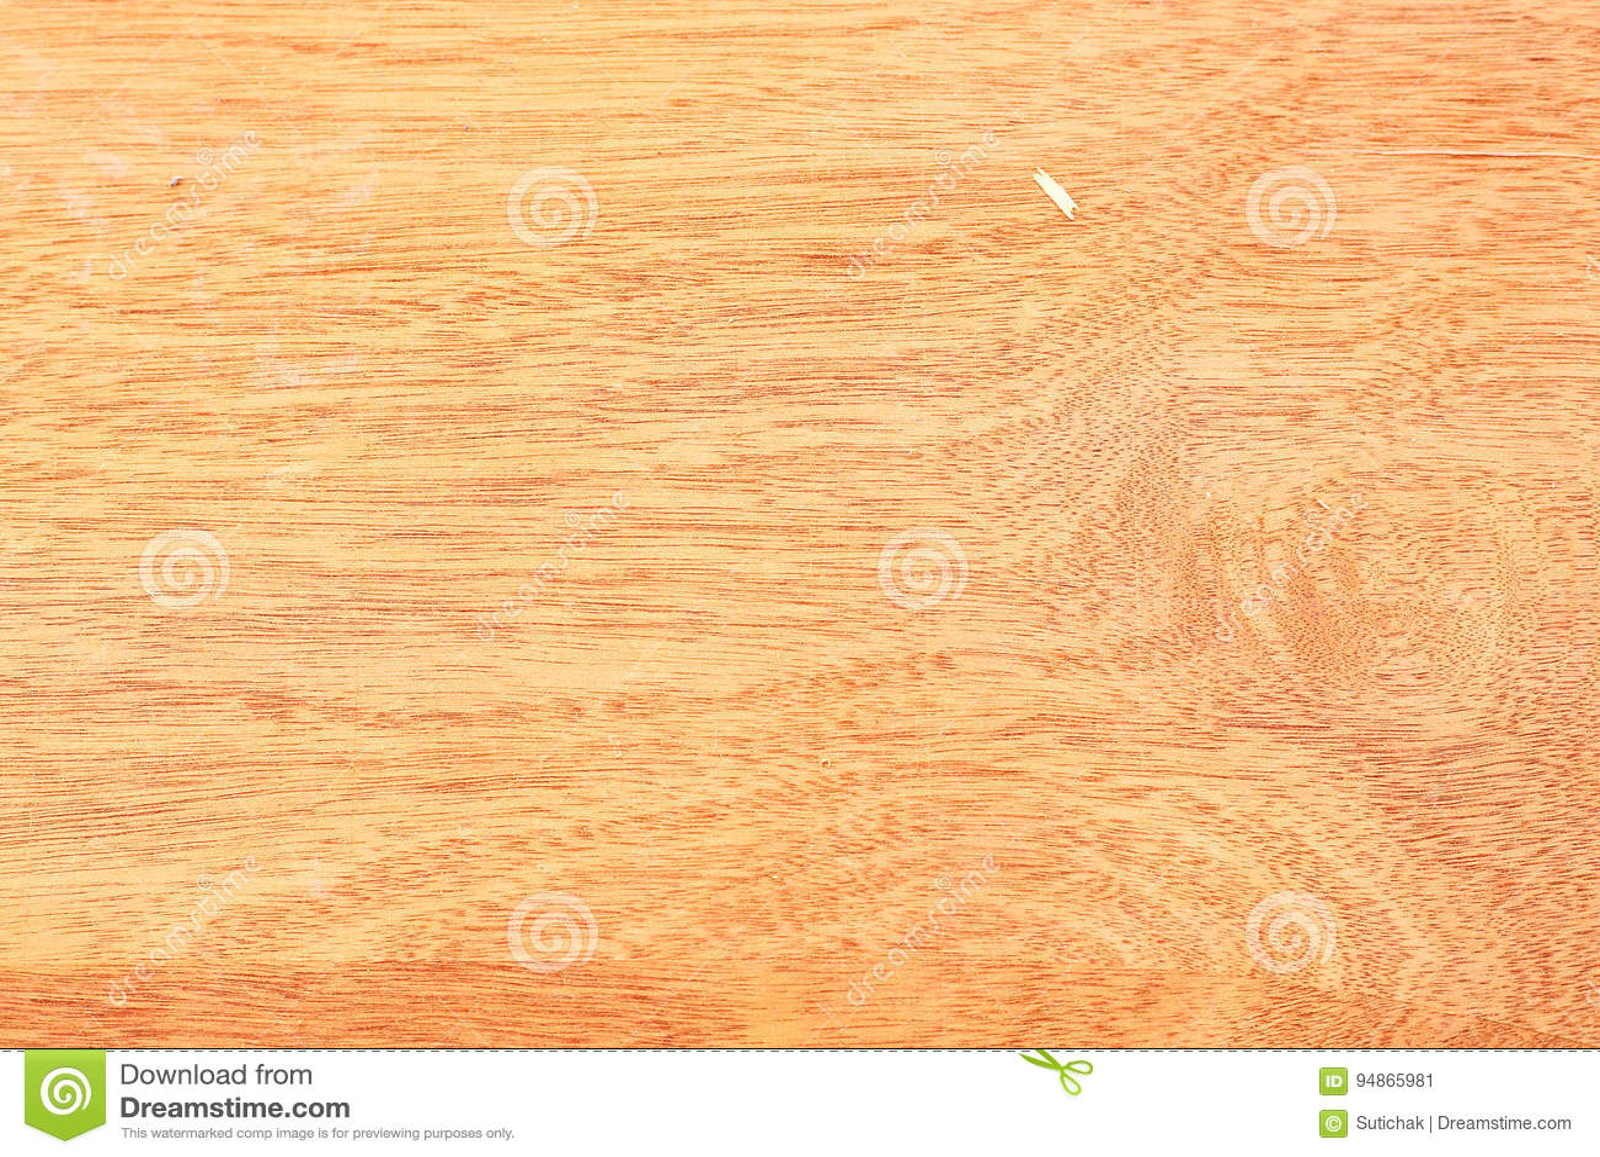 veneer wood panel texture